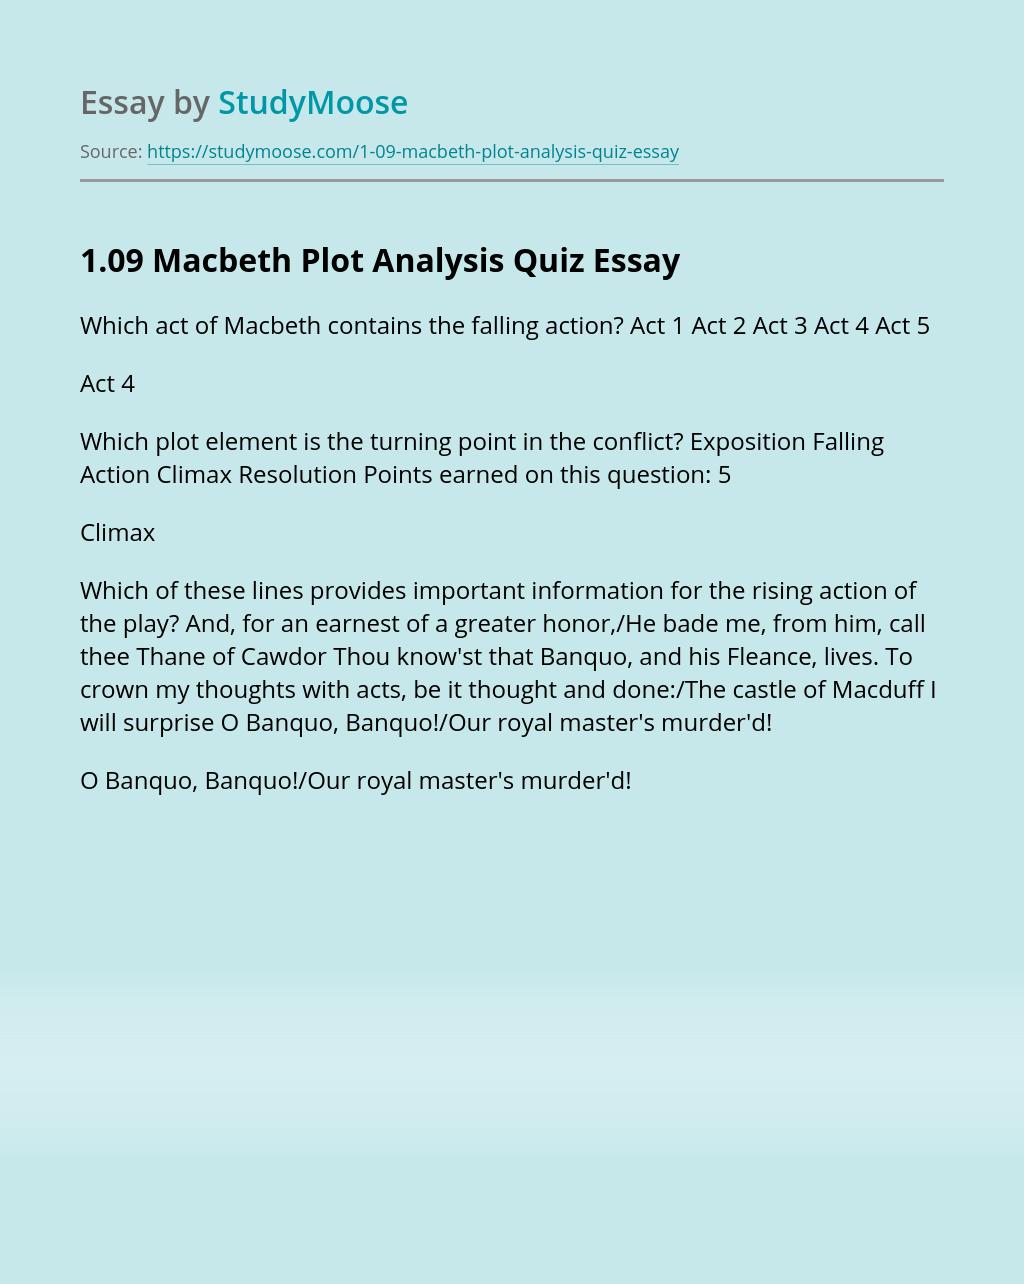 1.09 Macbeth Plot Analysis Quiz